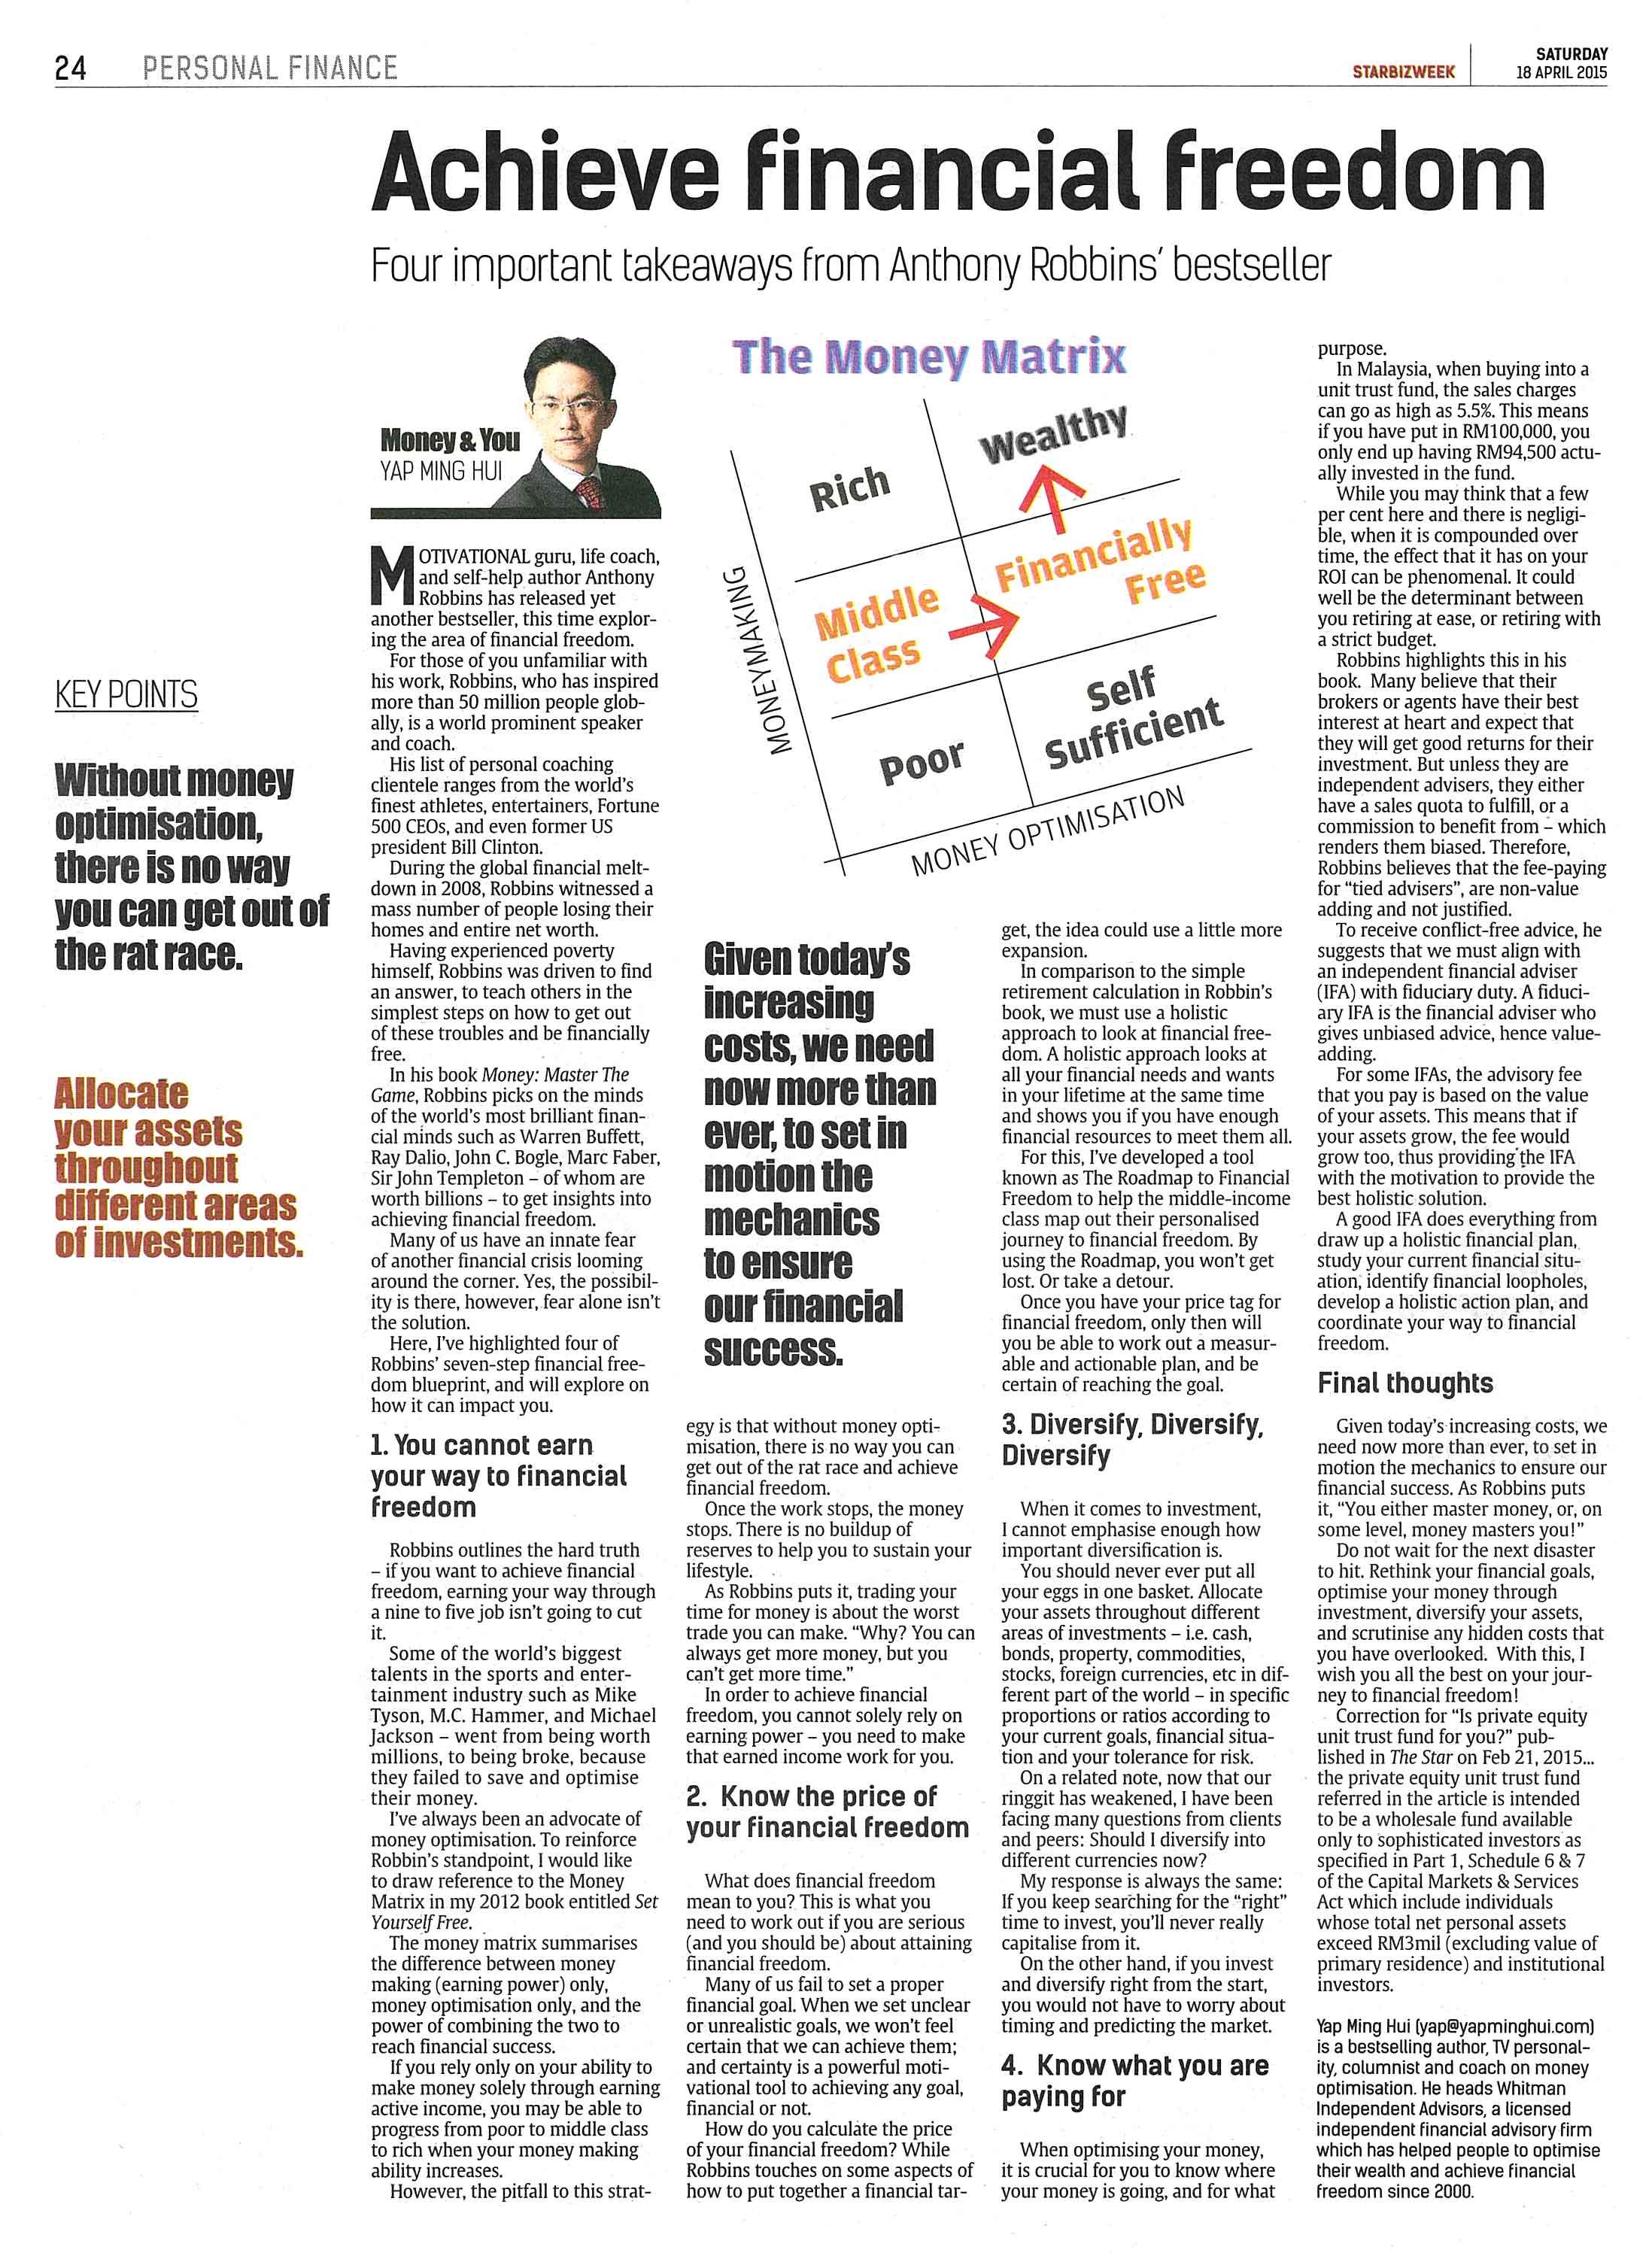 financial freedom malaysia